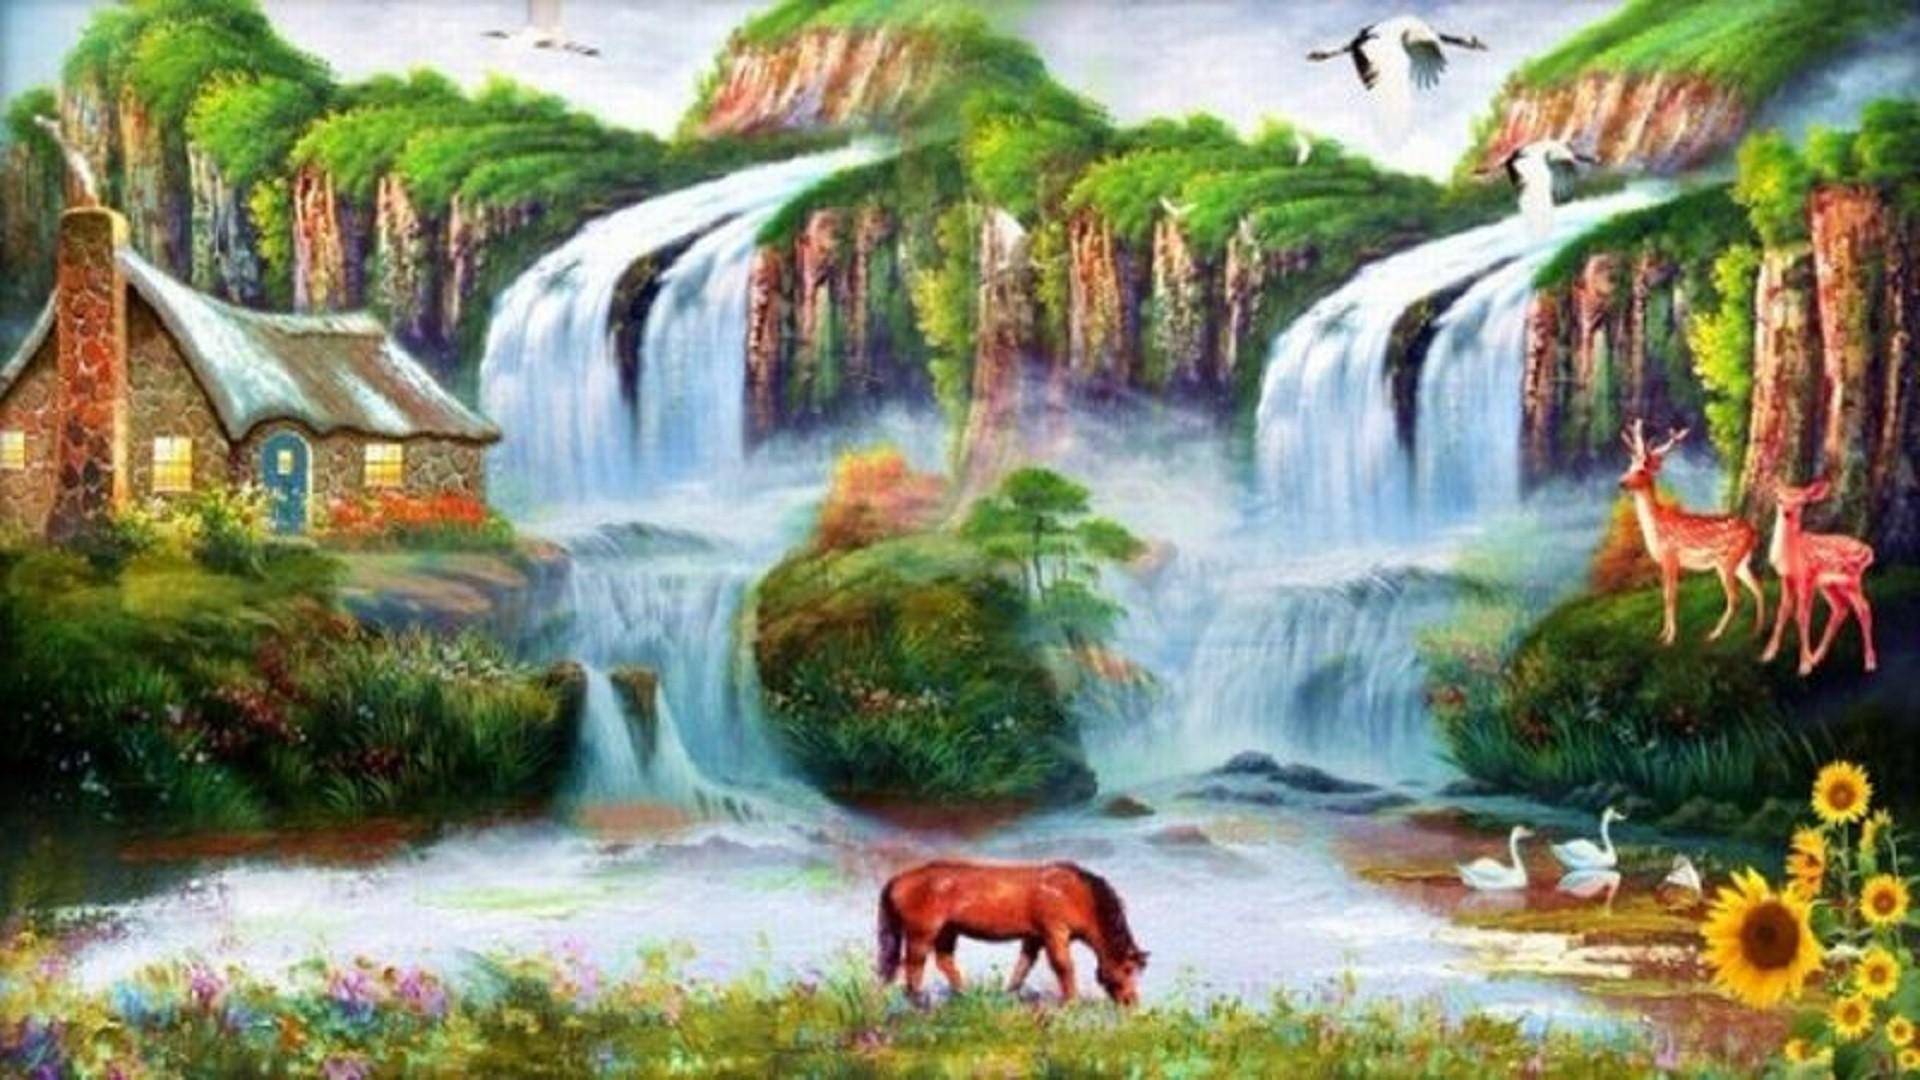 Fall Mountain Scenery Wallpaper Wallpaper Scenery Waterfall 53 Images